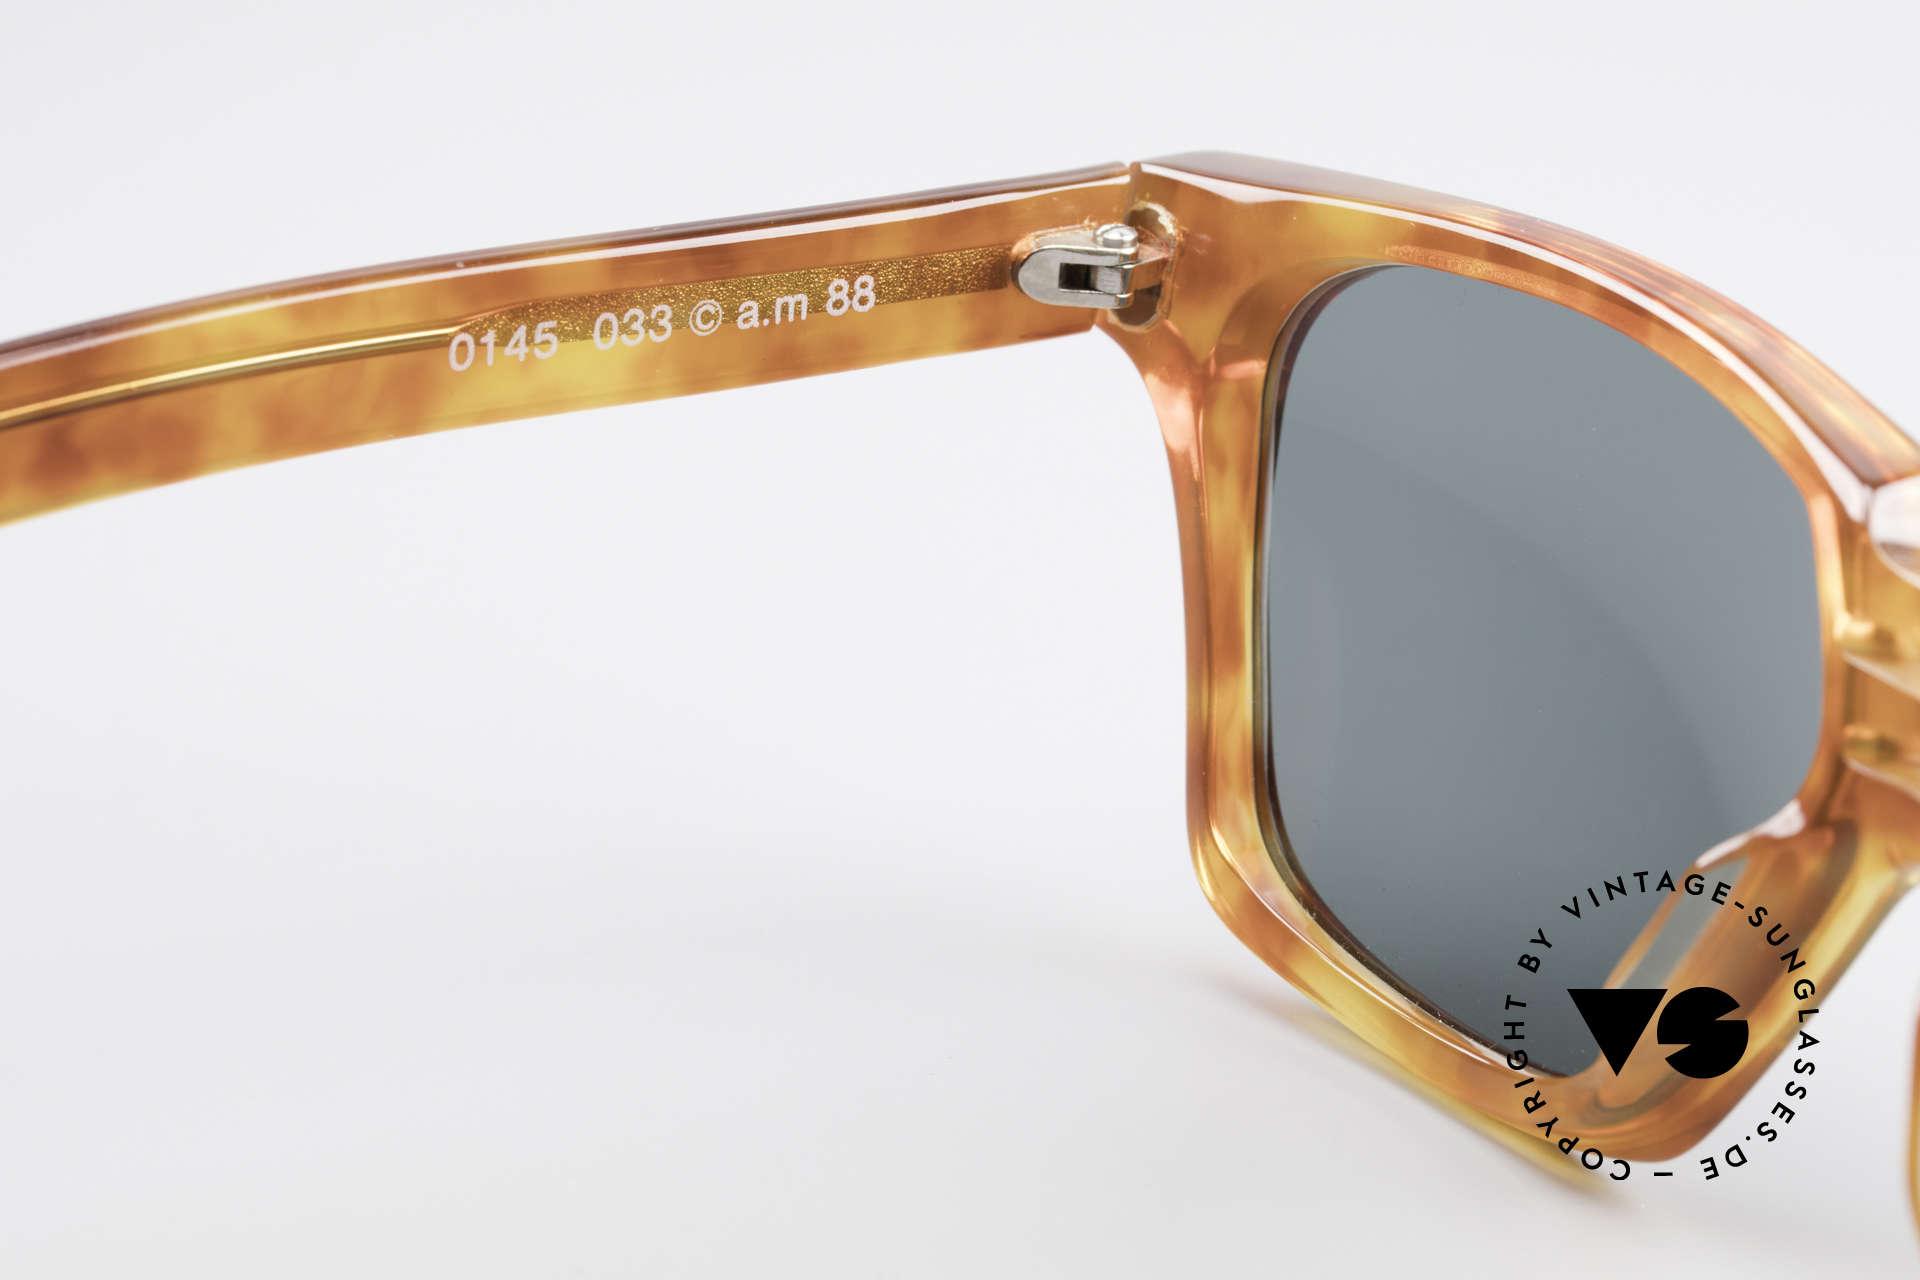 Alain Mikli 0145 / 033 Striking 1980's Sunglasses, the frame fits optical (sun) lenses / prescriptions, too, Made for Men and Women